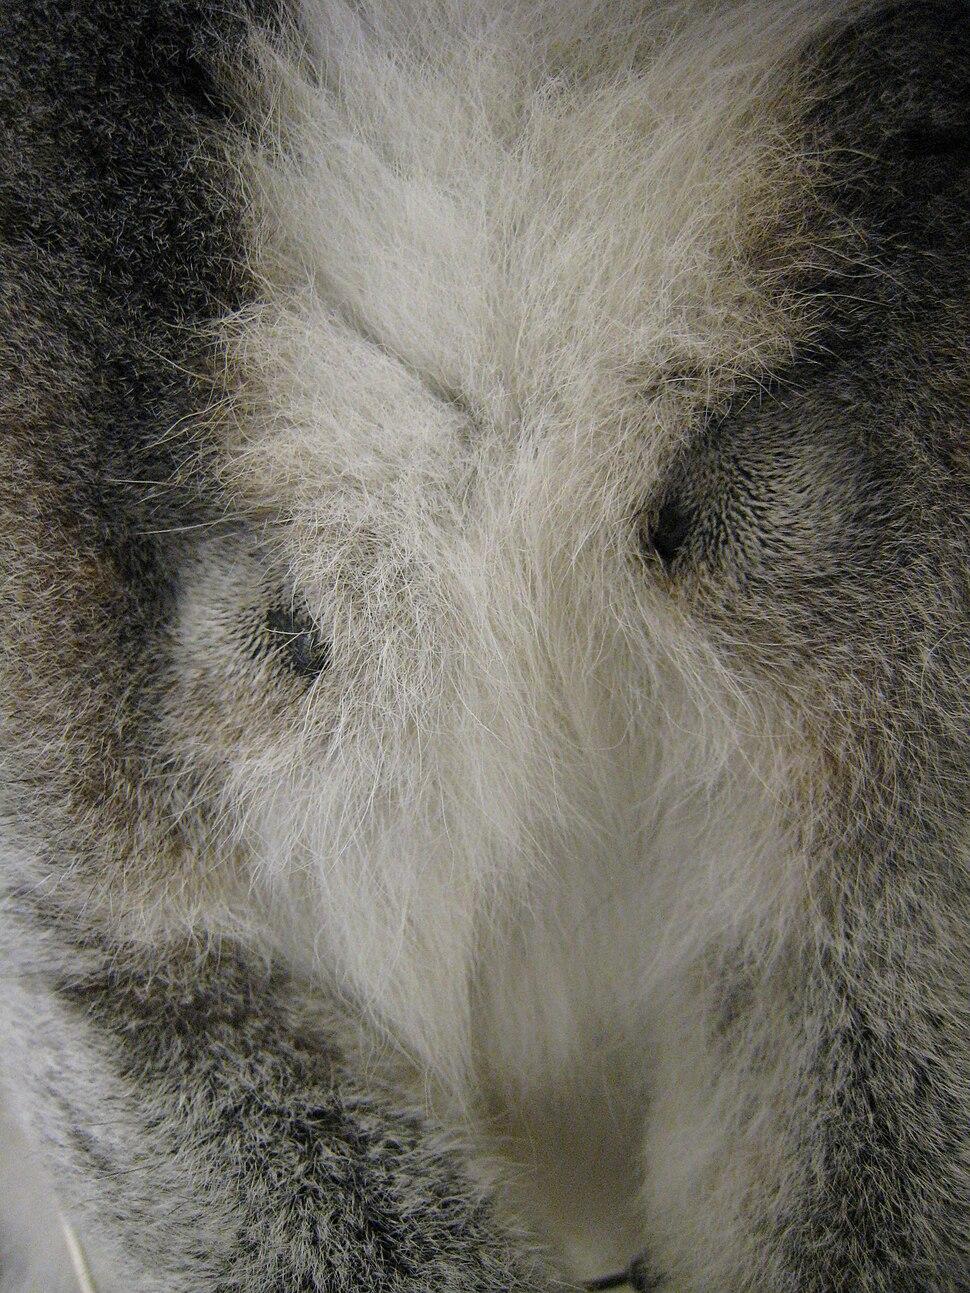 Lemur catta brachial glands